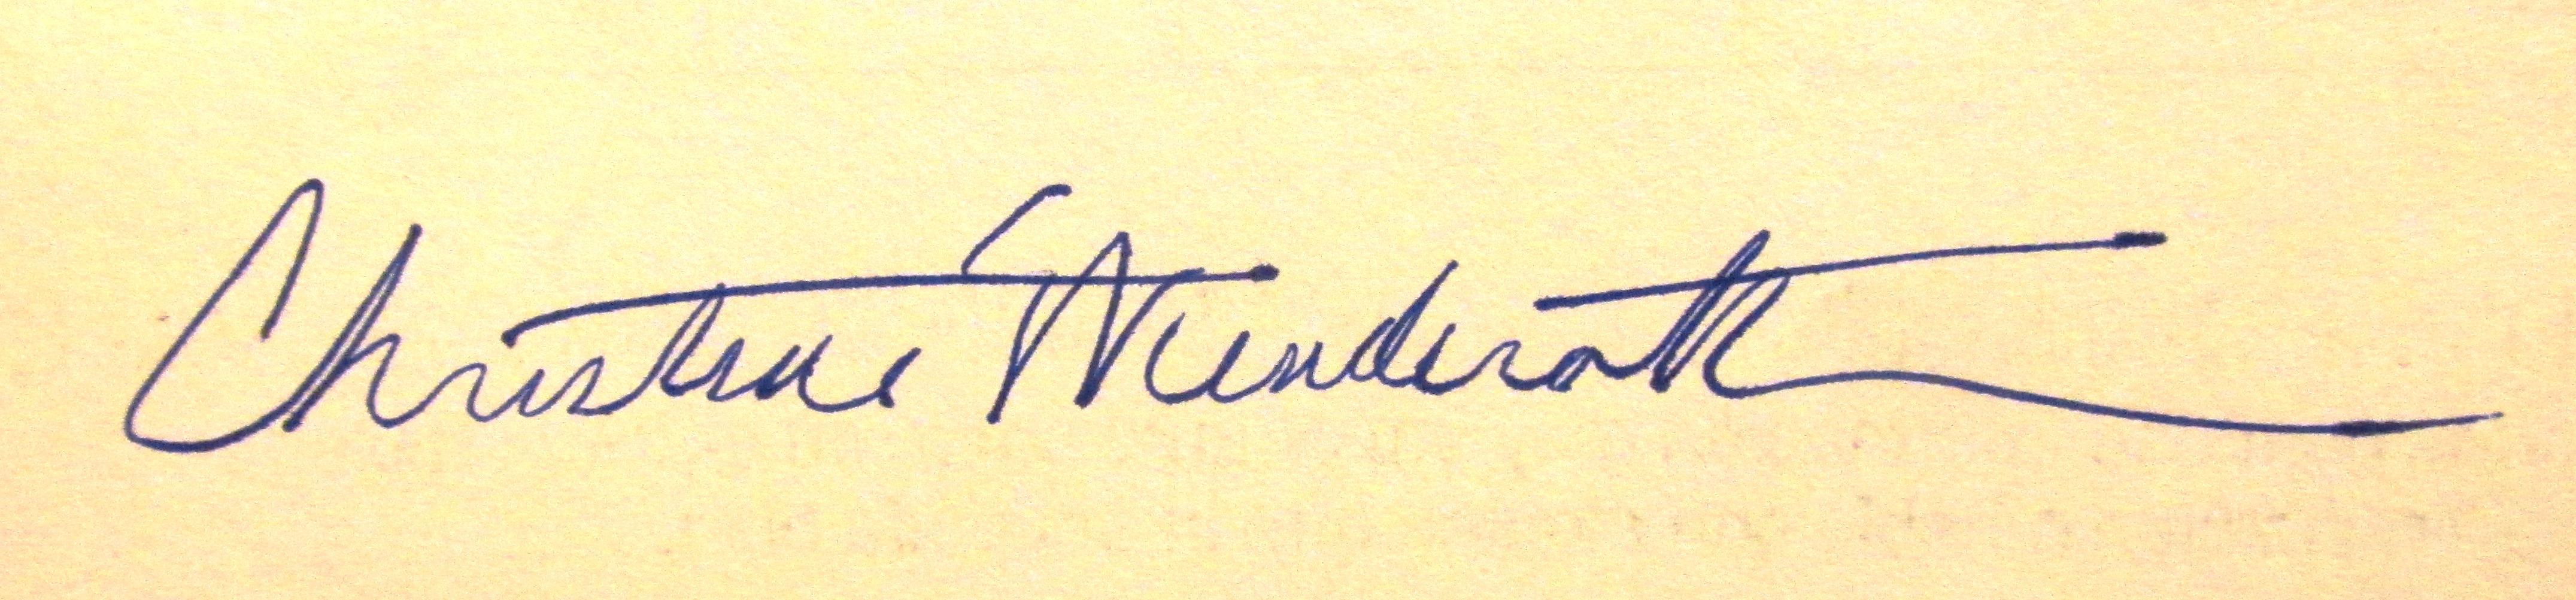 Christine Wenderoth Signature